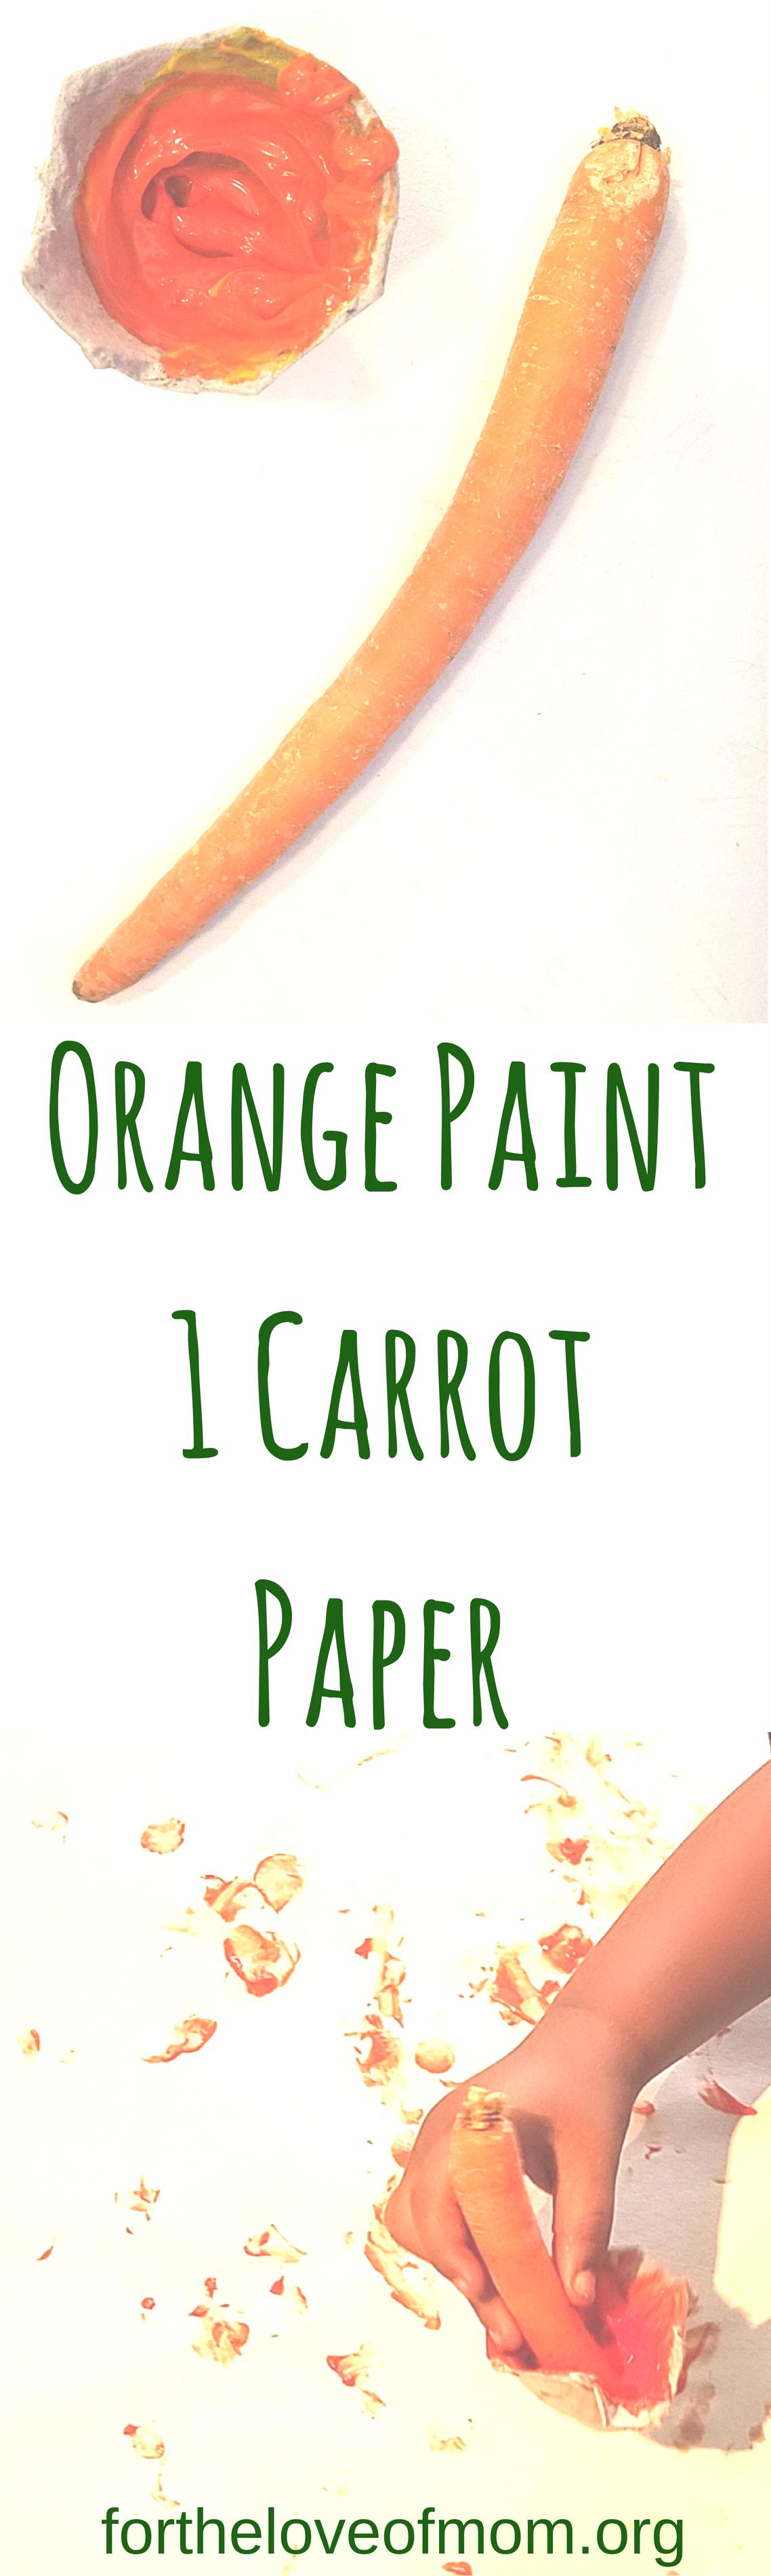 Veggie Crafts for Toddlers | Veggie Activities for Preschoolers | Carrot Painting | Veggie Painting | #toddlers | #preschoolers | #